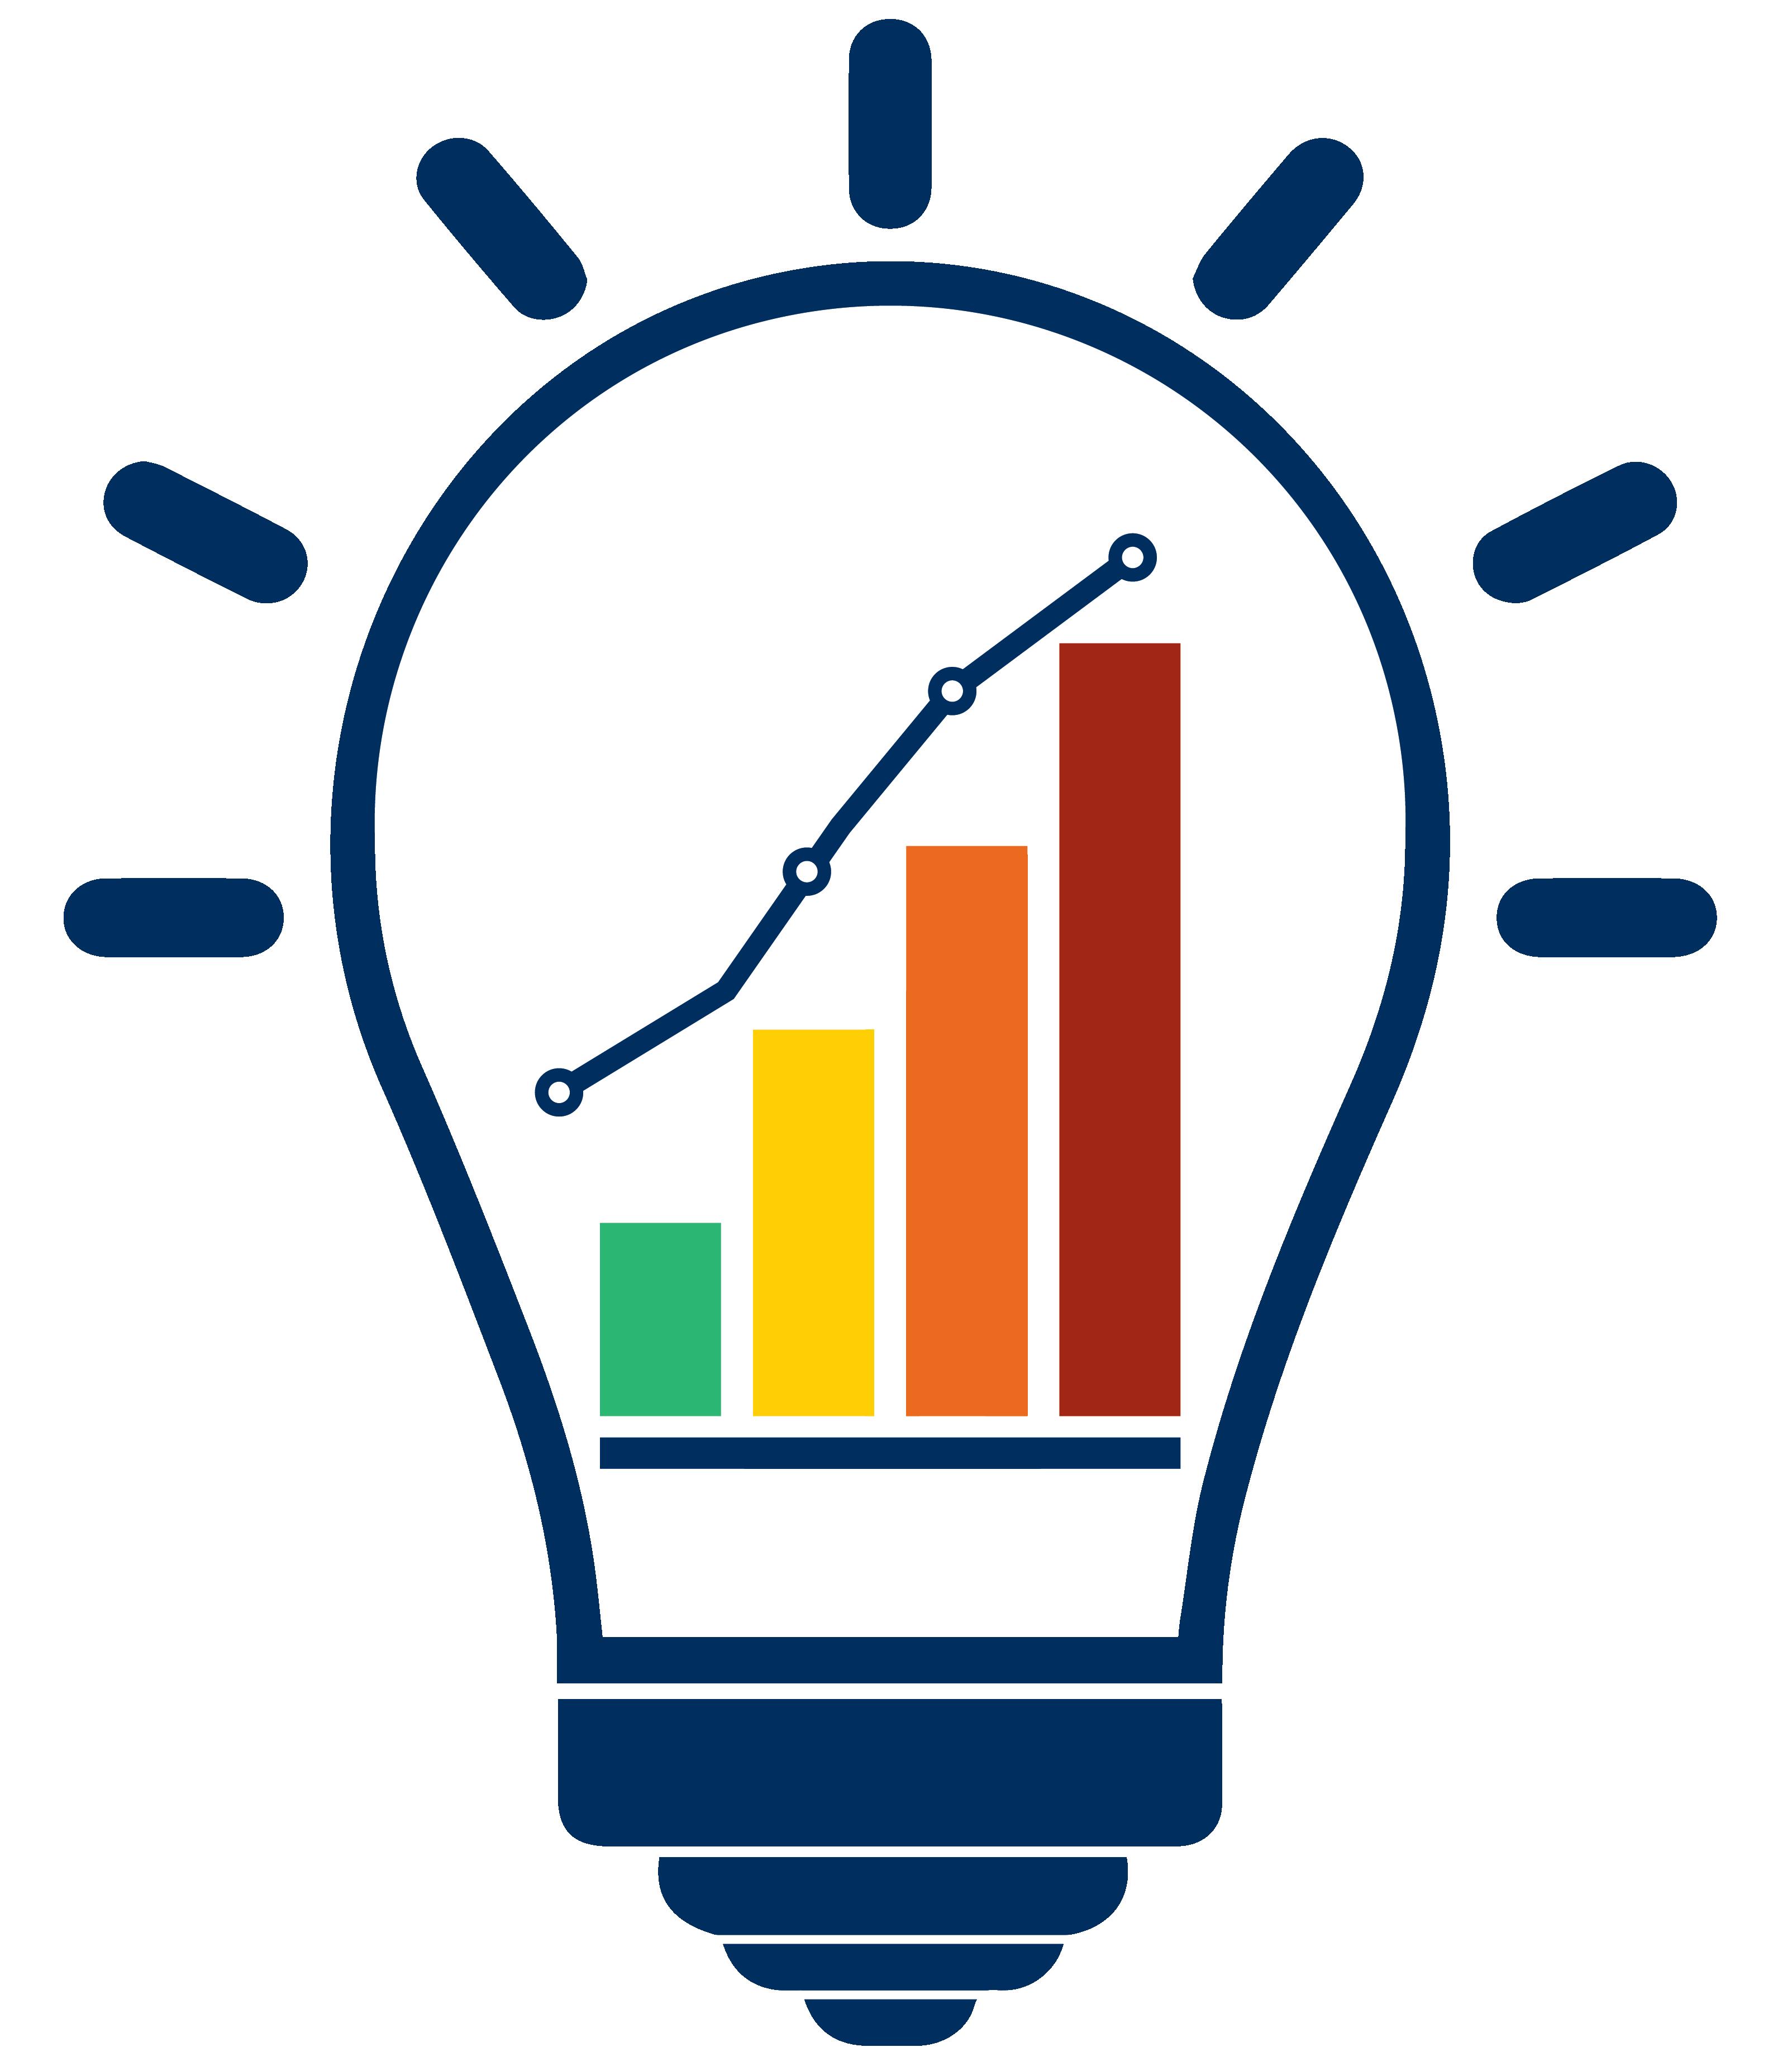 Blue lightbulb icon showing escalation plan